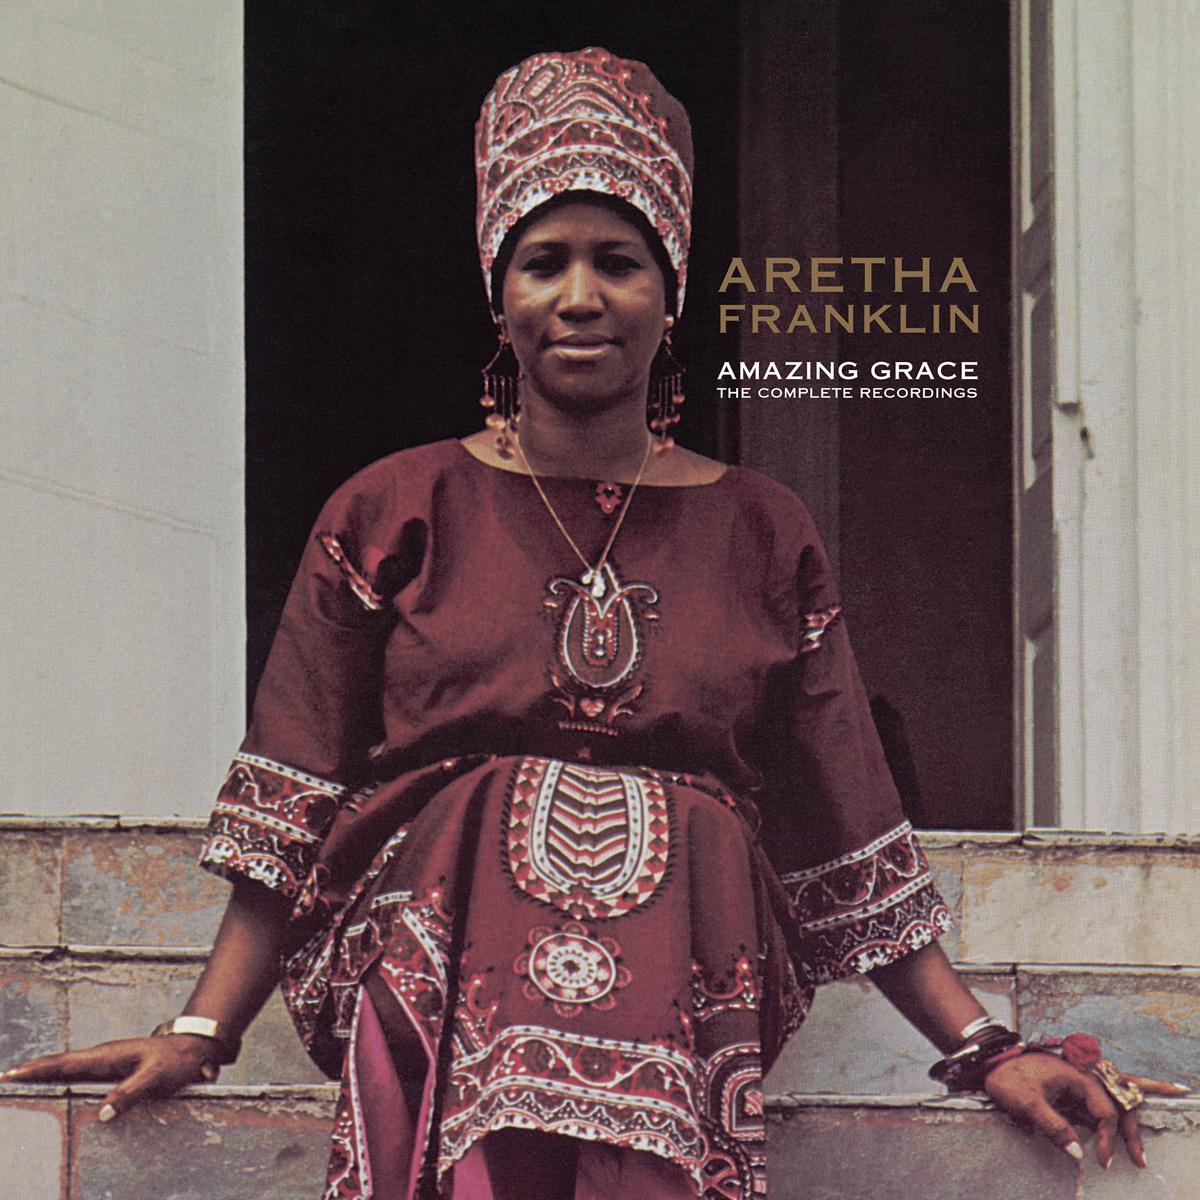 цена на Арета Фрэнклин Aretha Franklin. Amazing Grace: The Complete Recordings (4 LP)